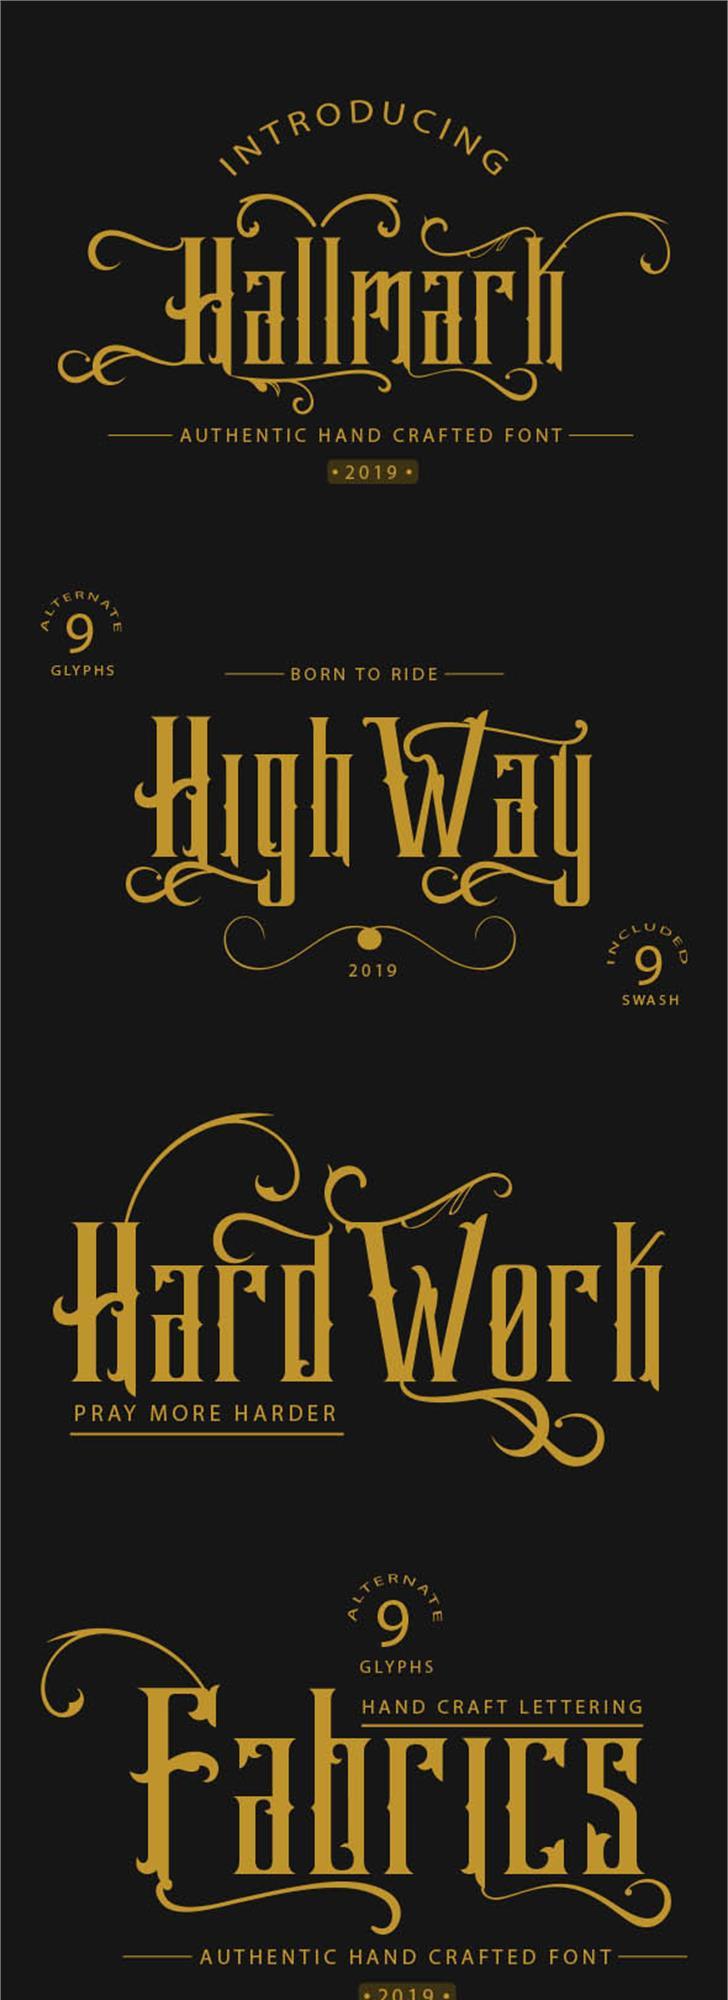 Hallmark demo Font design poster